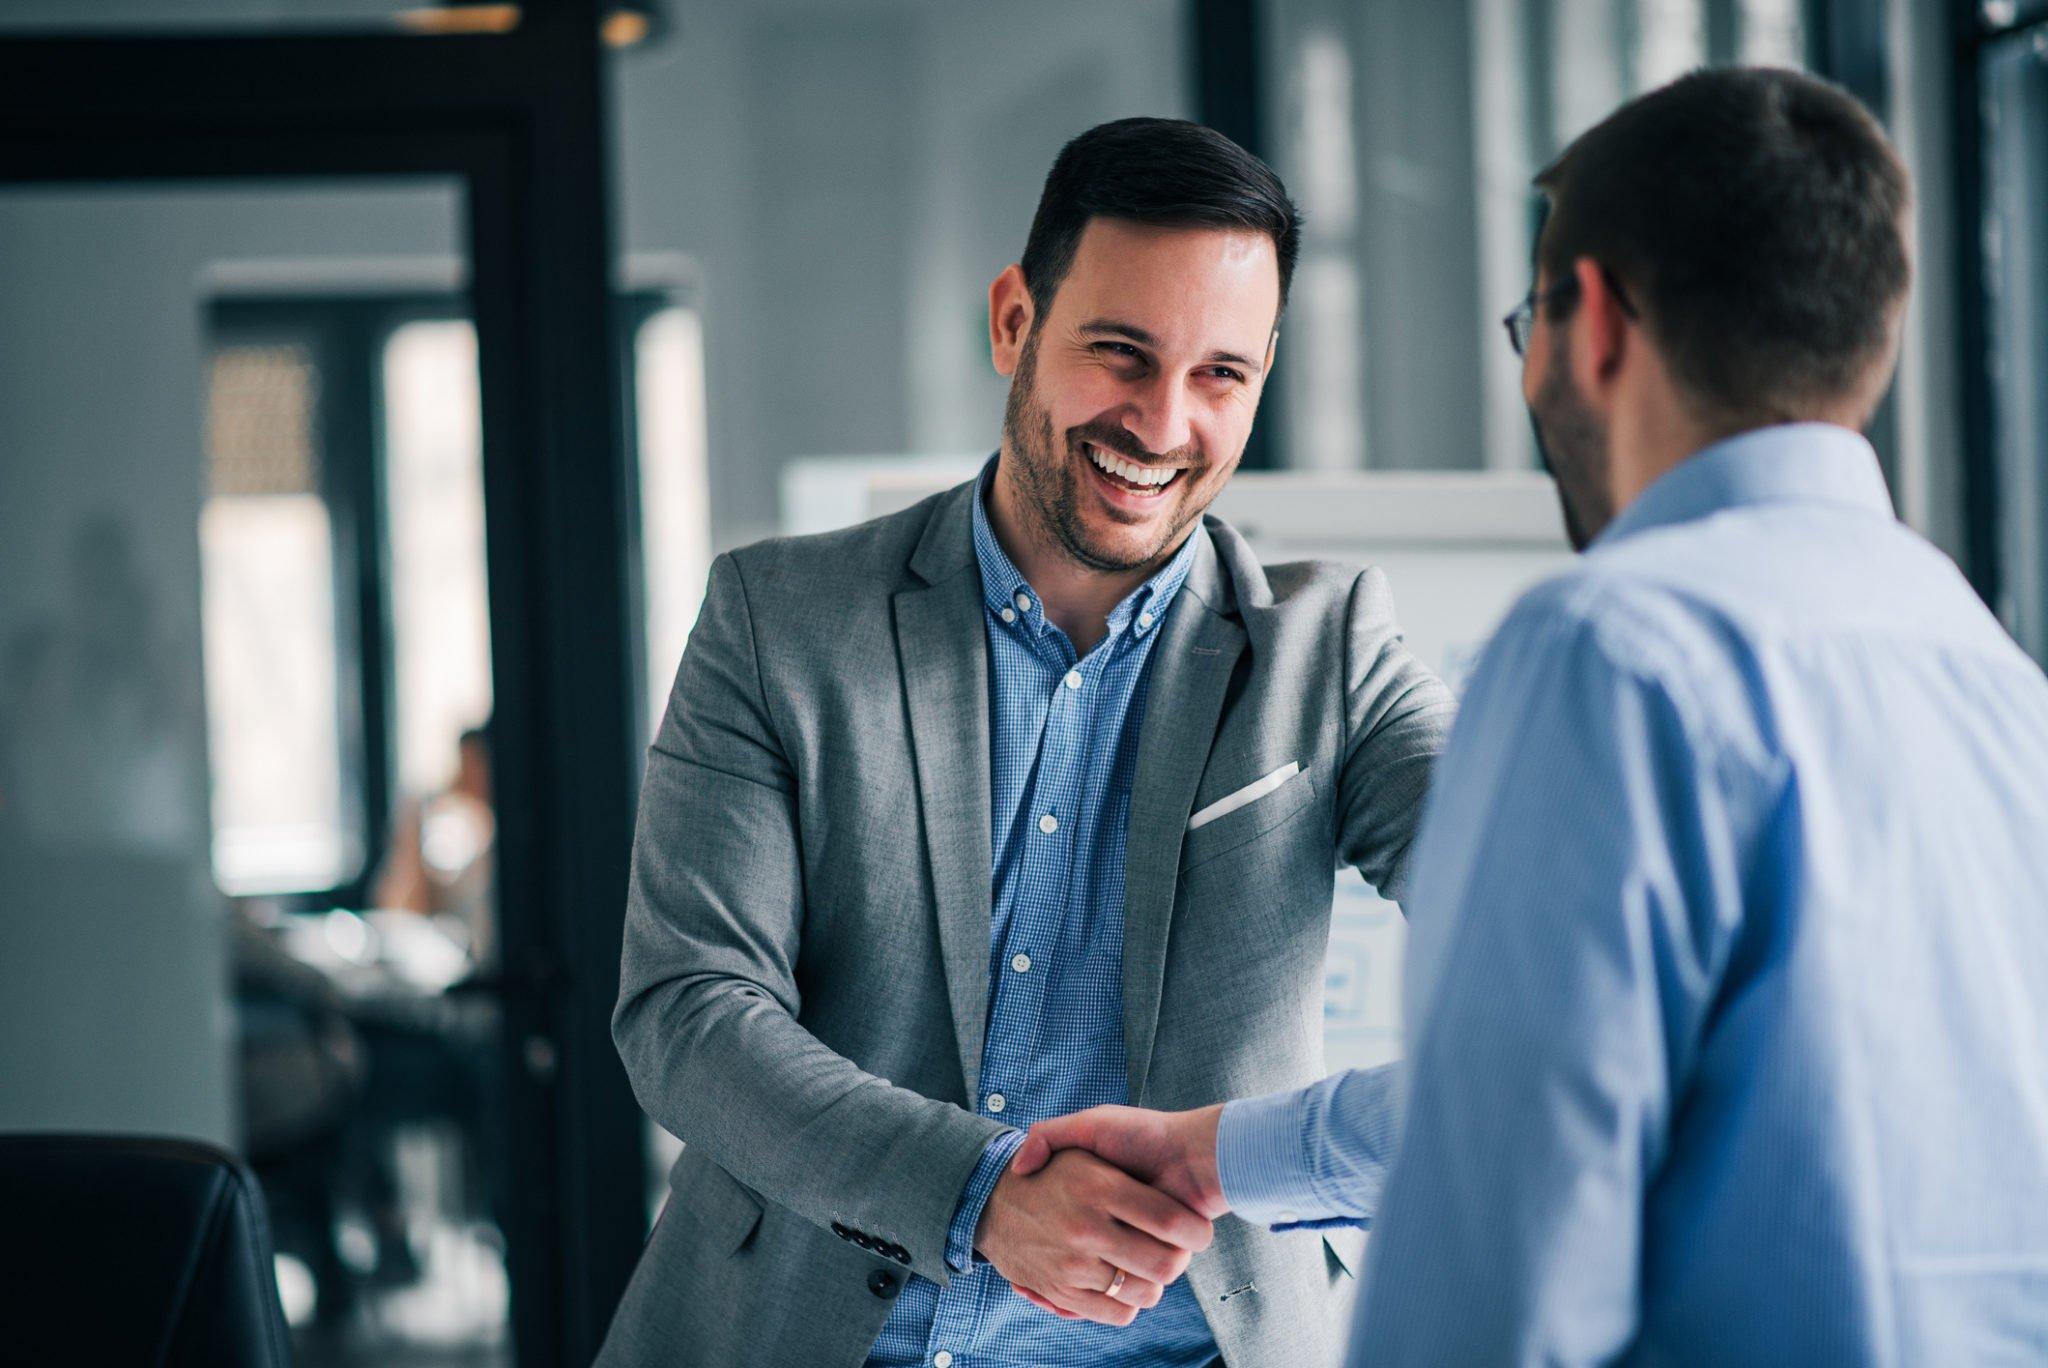 professional insurance broker shaking hands